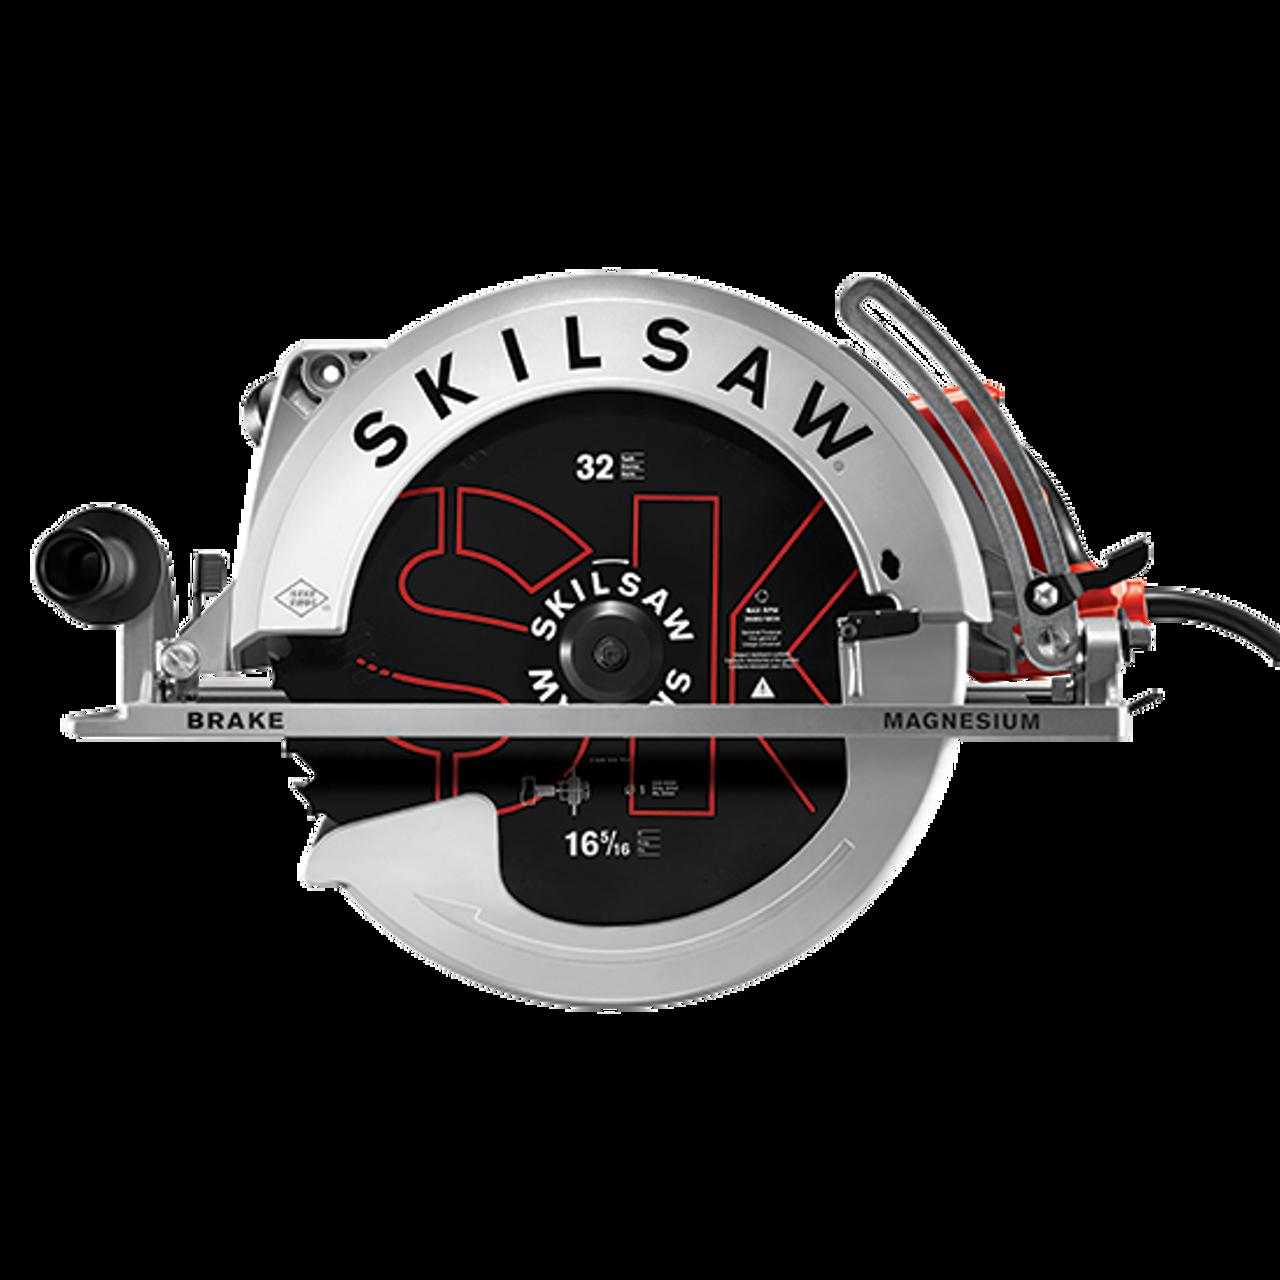 "Skilsaw 16-5/16"" Magnesium Super Sawsquatch / Big Foot Circular Saw"